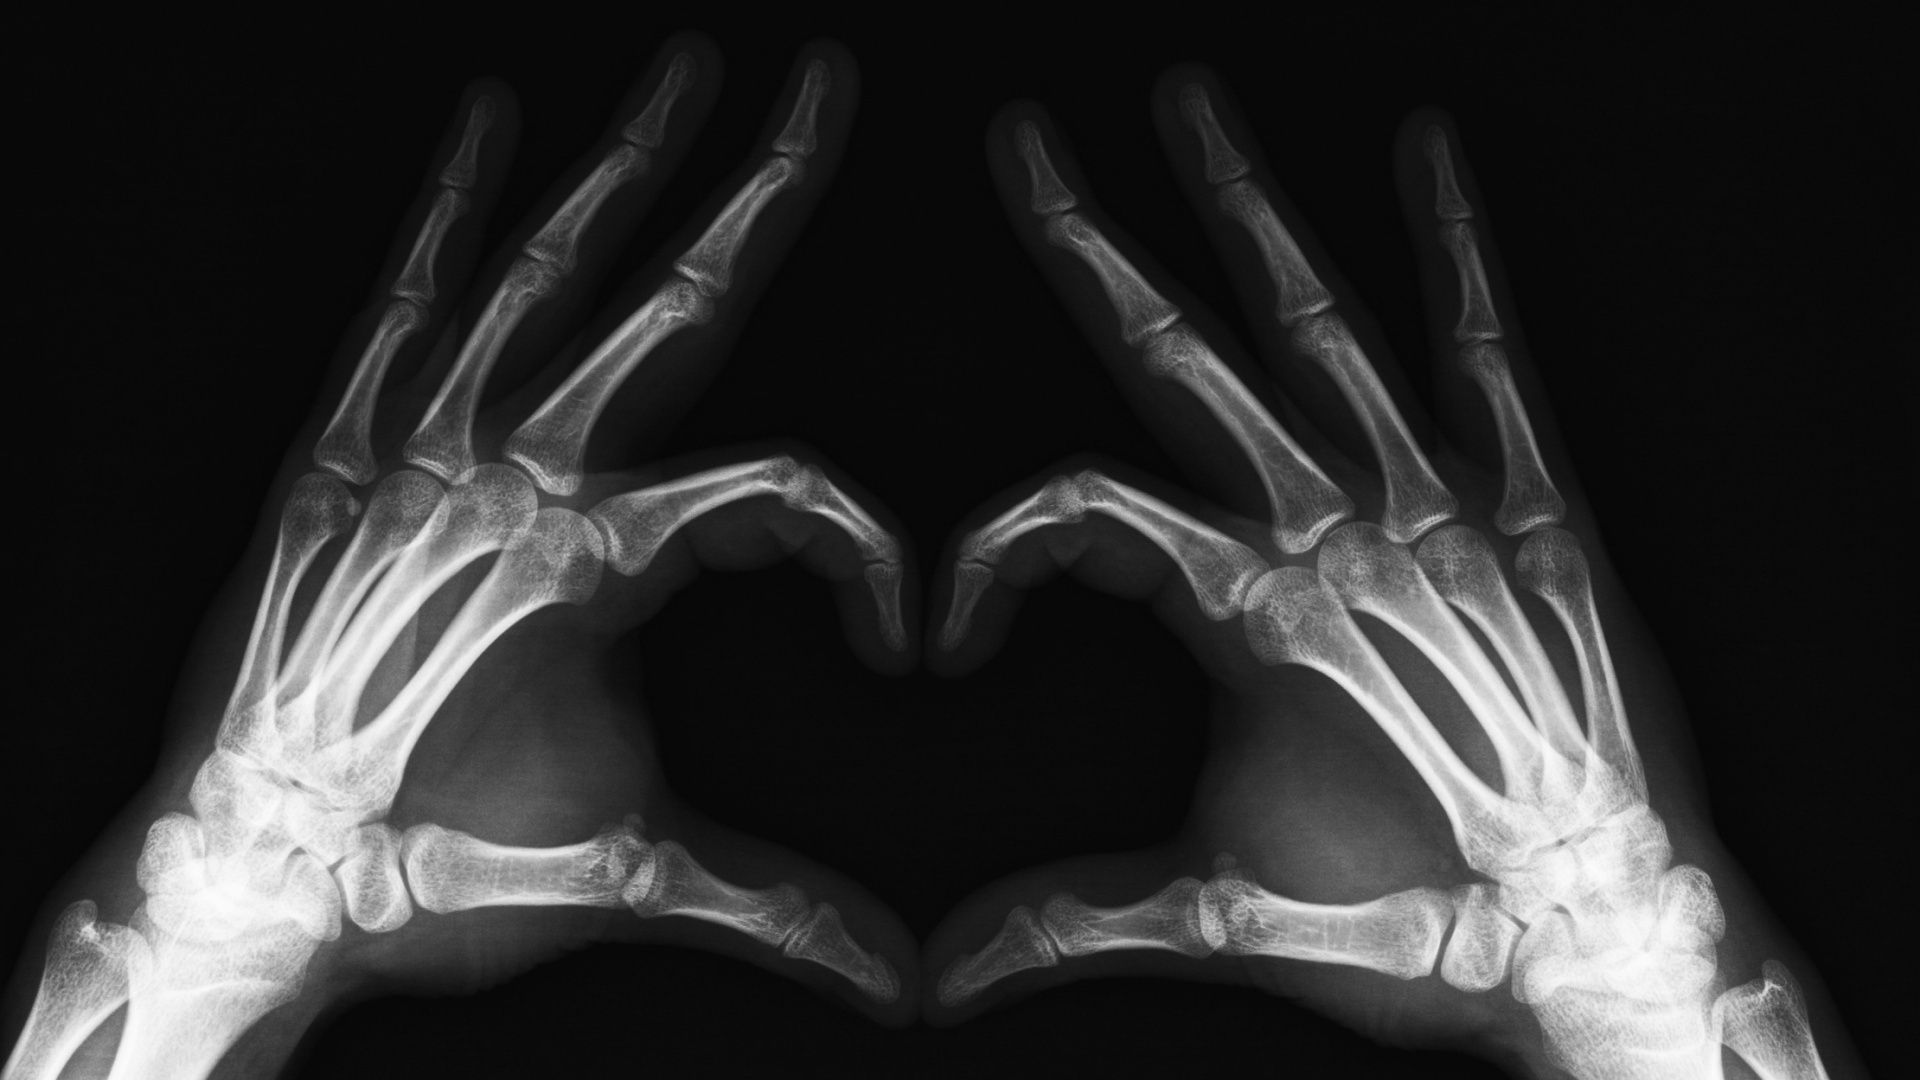 Funny Xray Tech Memes : Xray radiology radiologyhumor radtech xraytech aidet memes